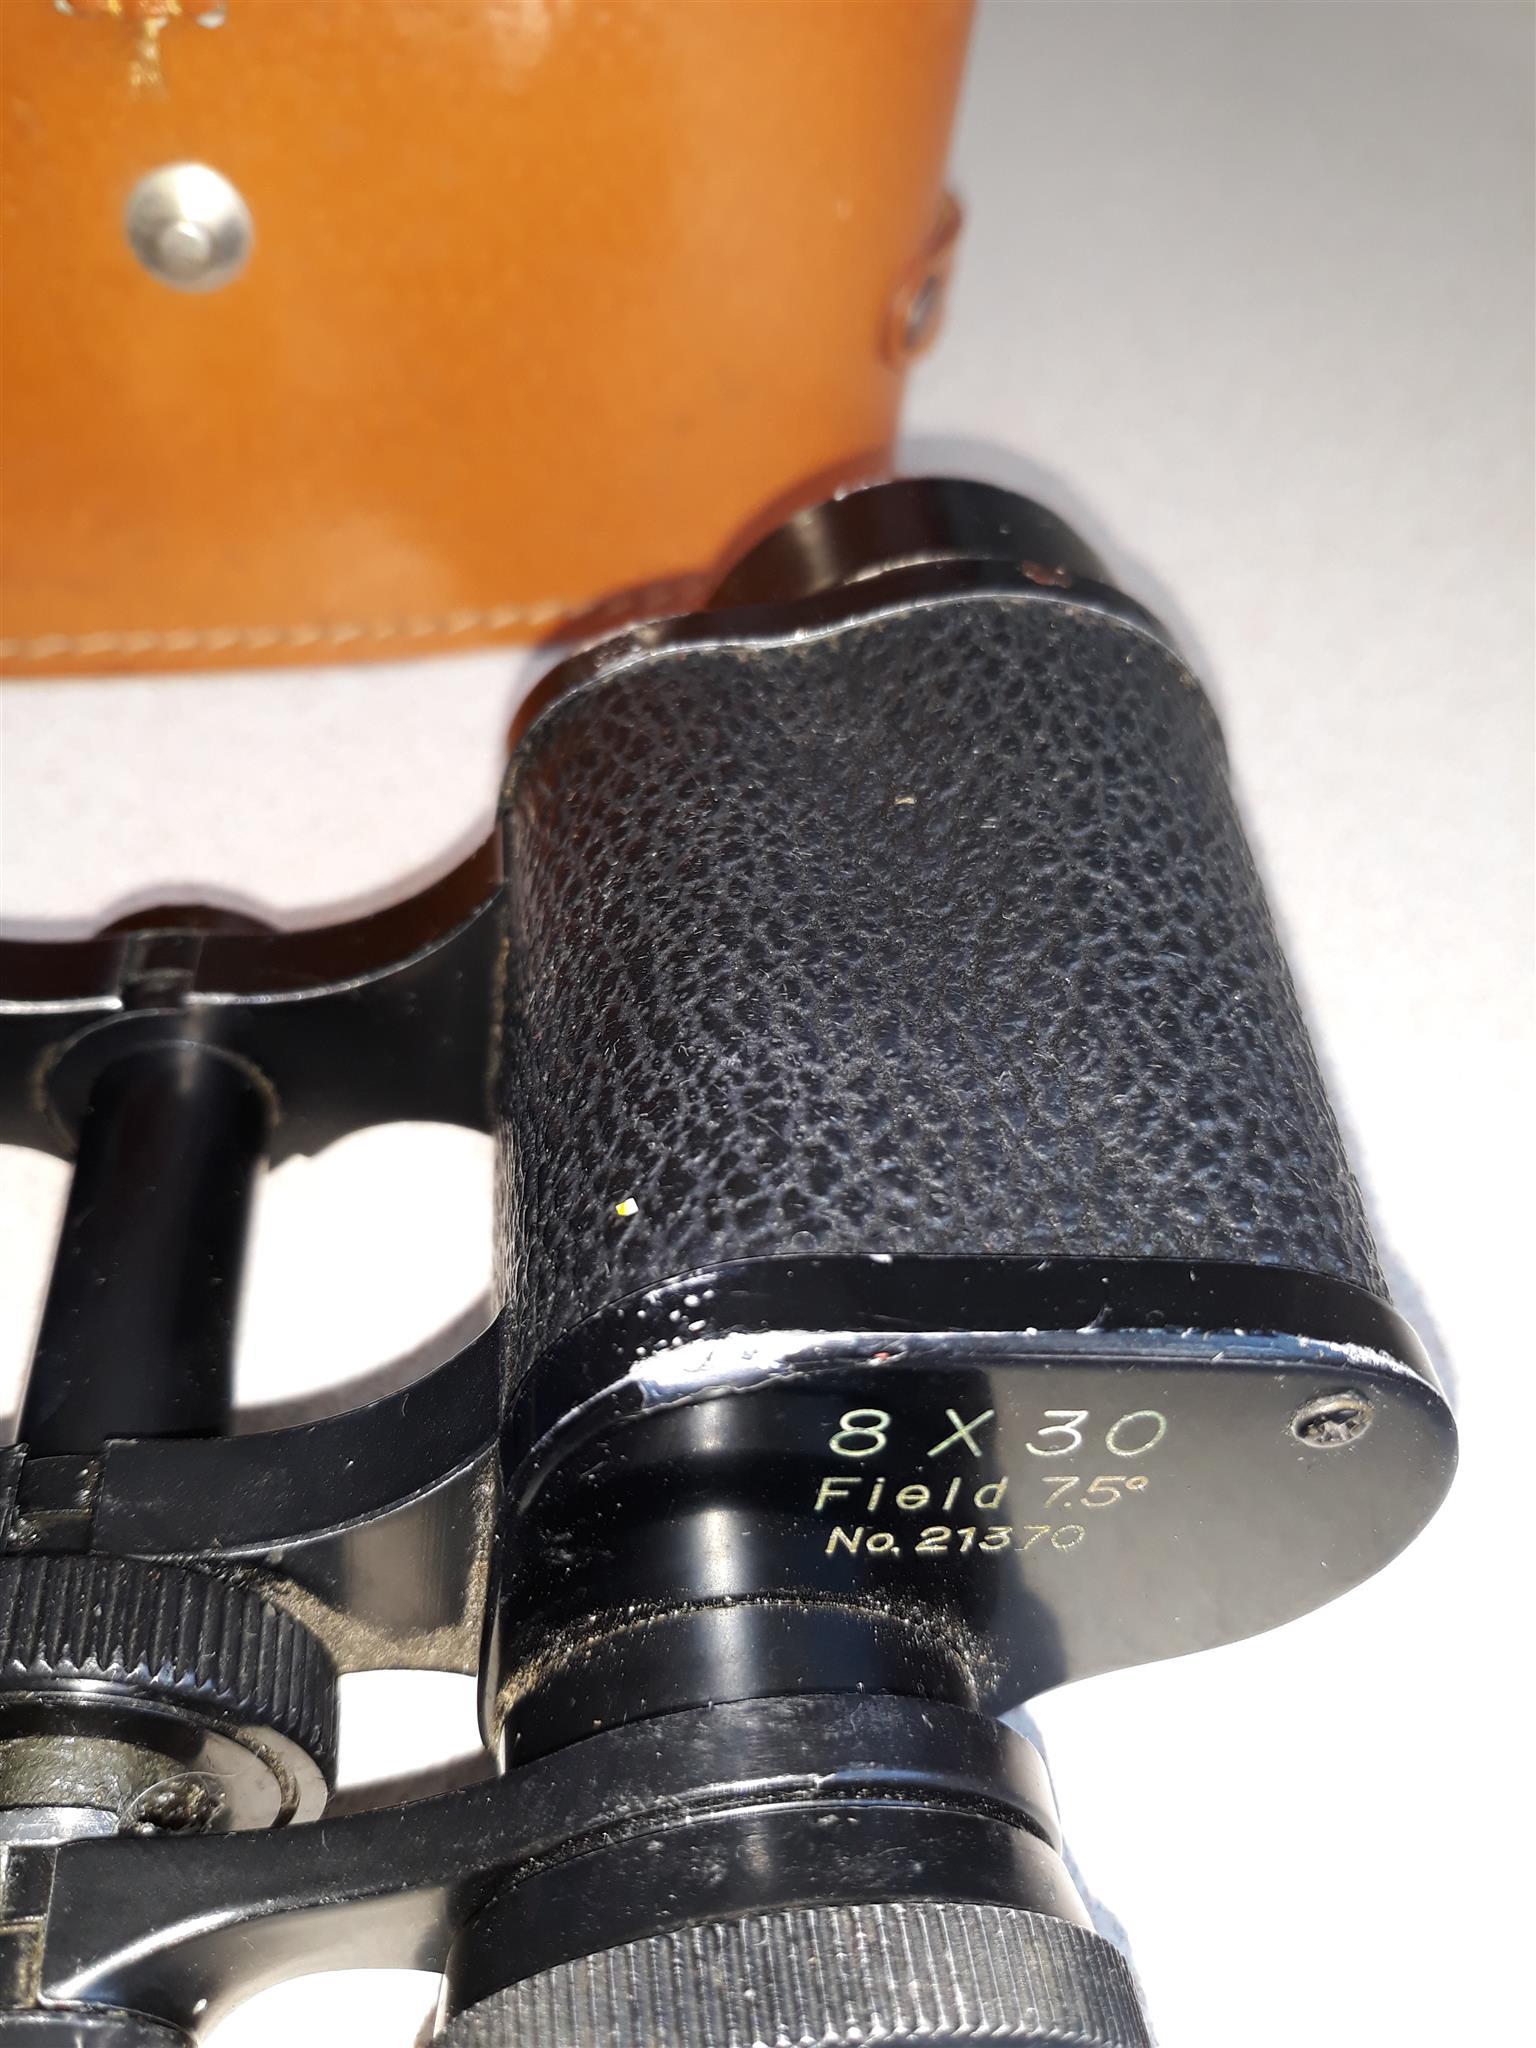 Collectors' Binoculars in Leather case